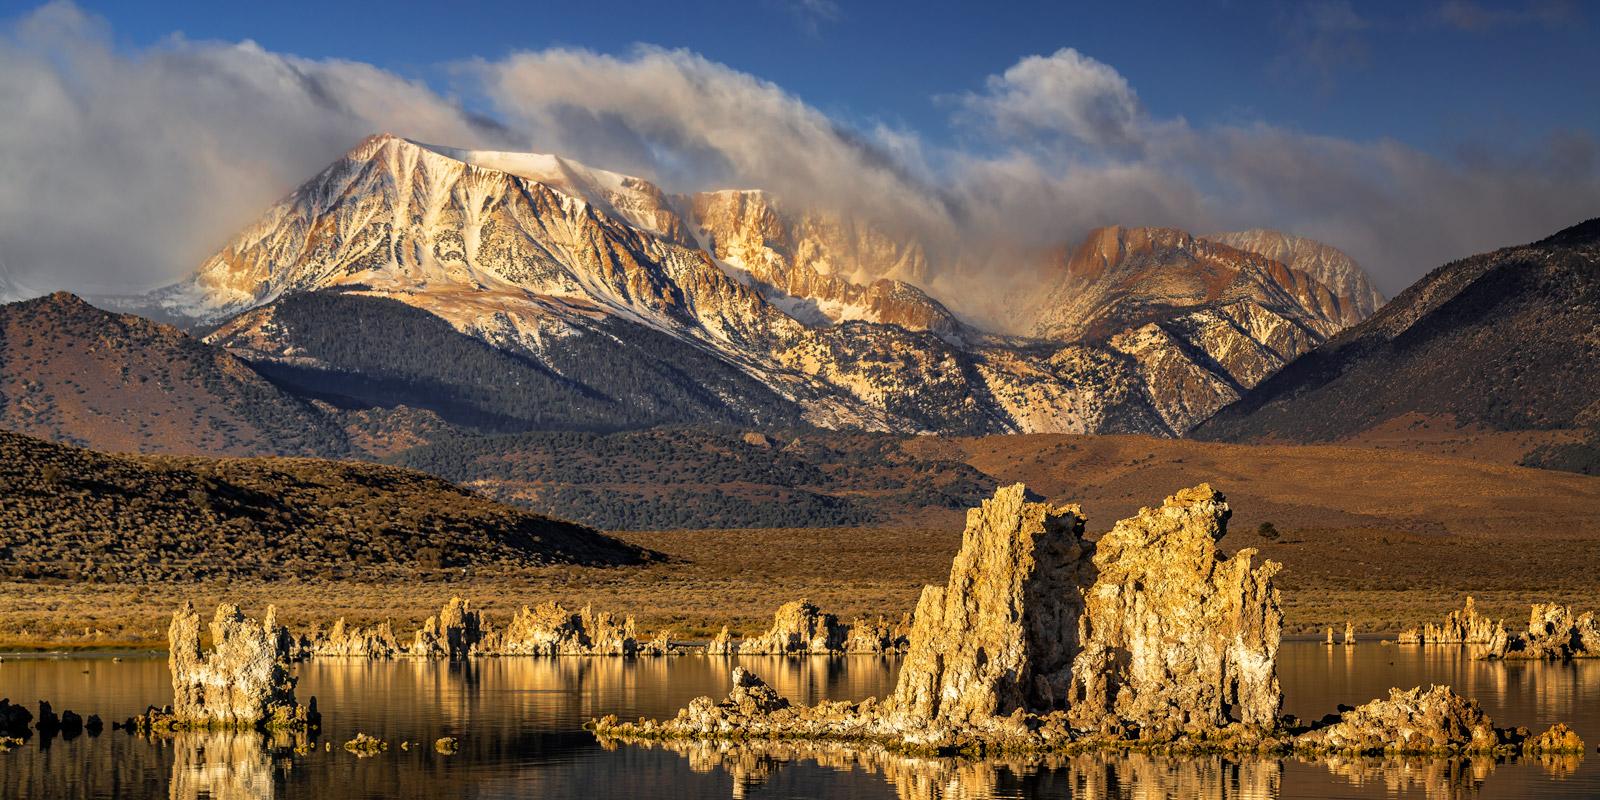 California, Eastern Sierra, Mono Lake, Mountain, Tufa, Sunrise, photo